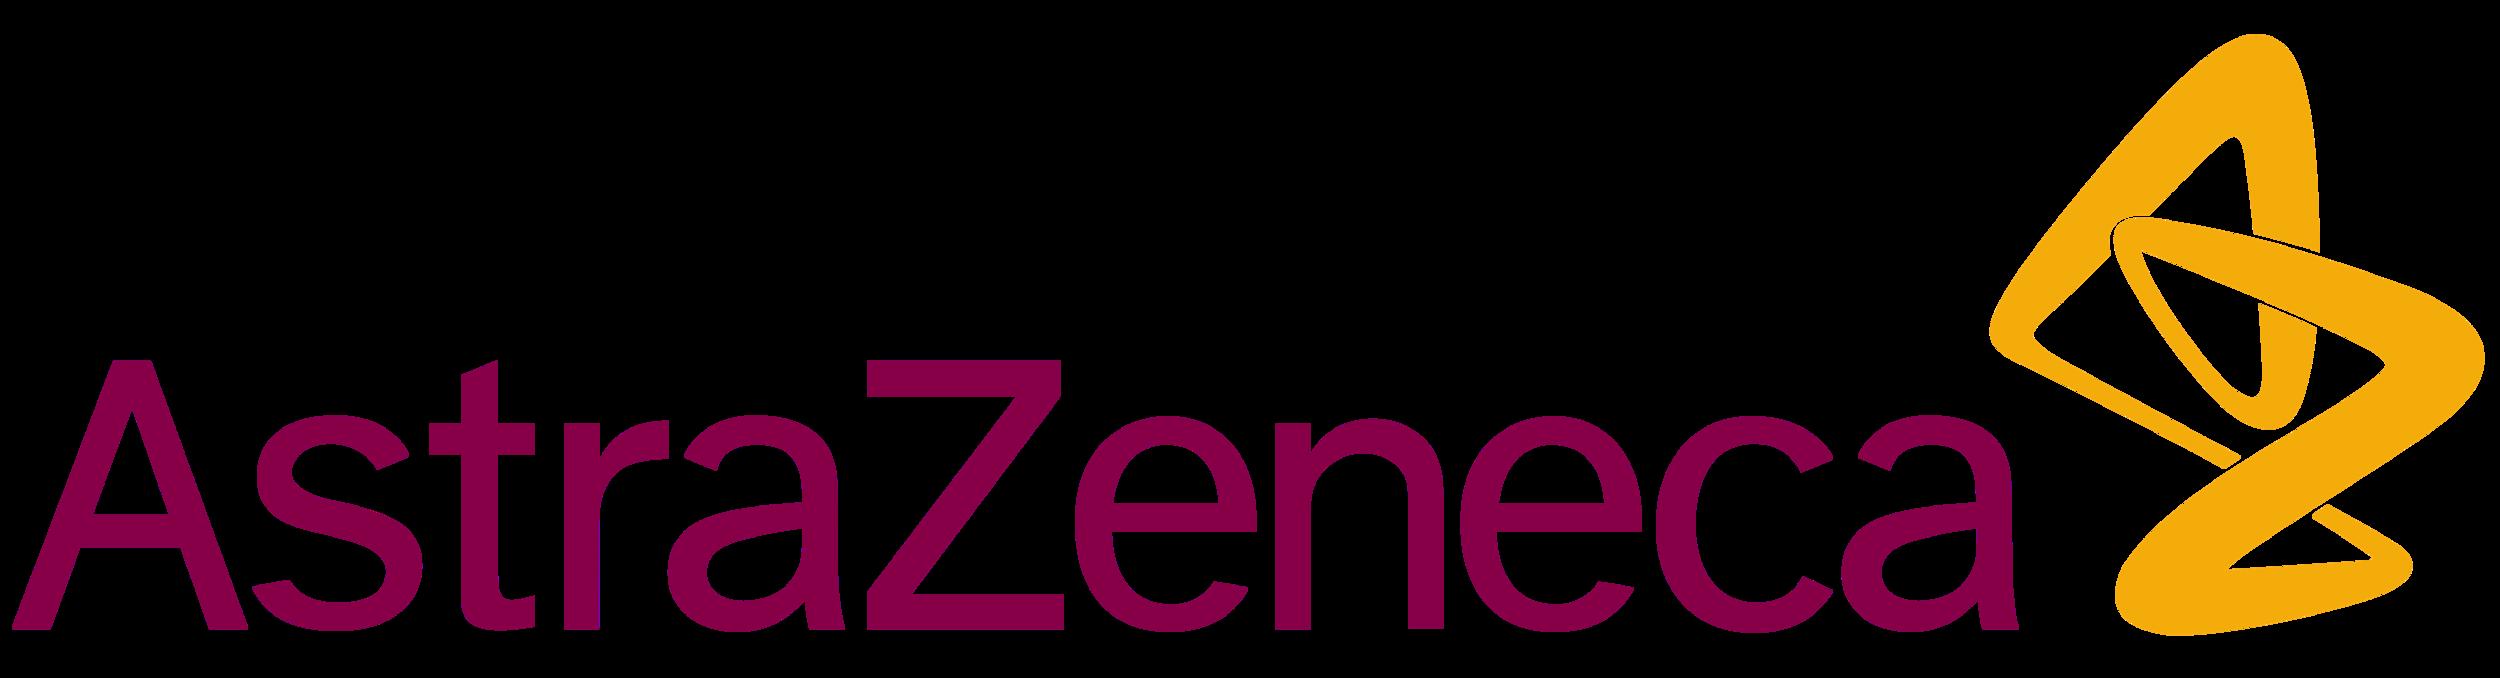 astrazeneca-logo-png-astrazeneca-logo-astra-zeneca-4902.png